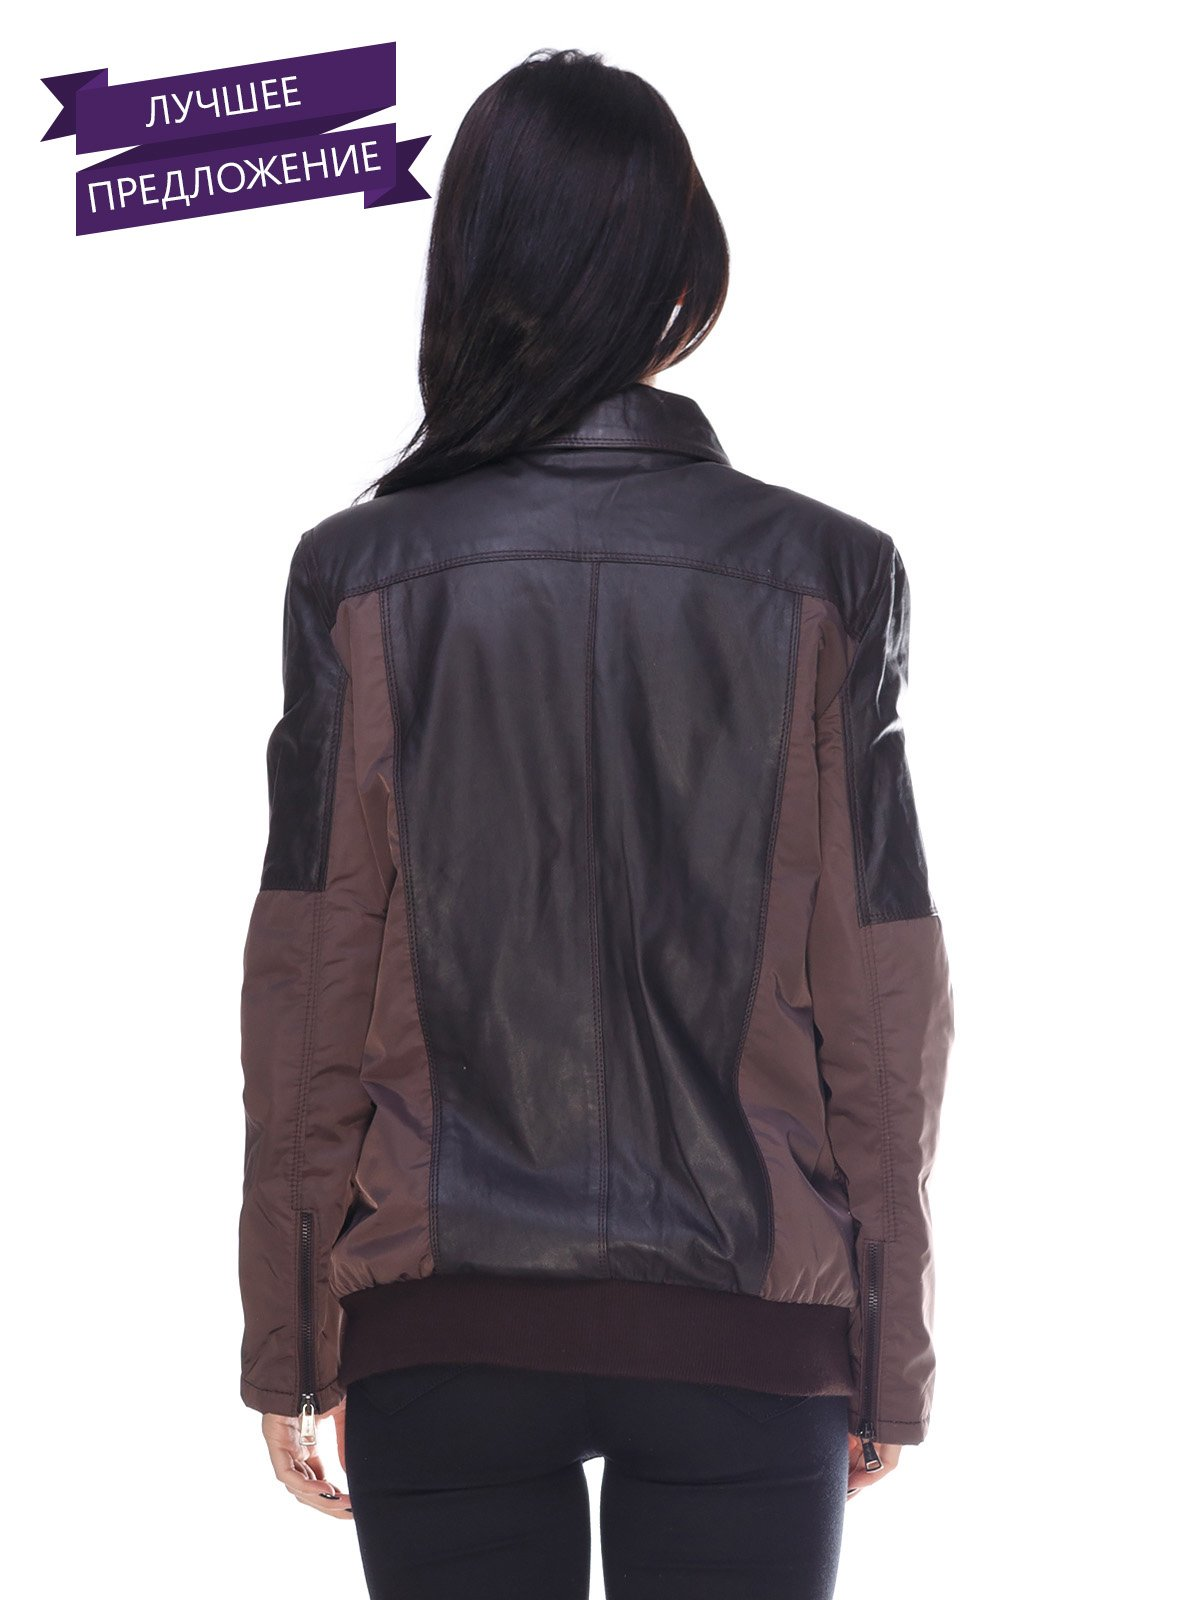 Куртка коричневая   3212672   фото 2